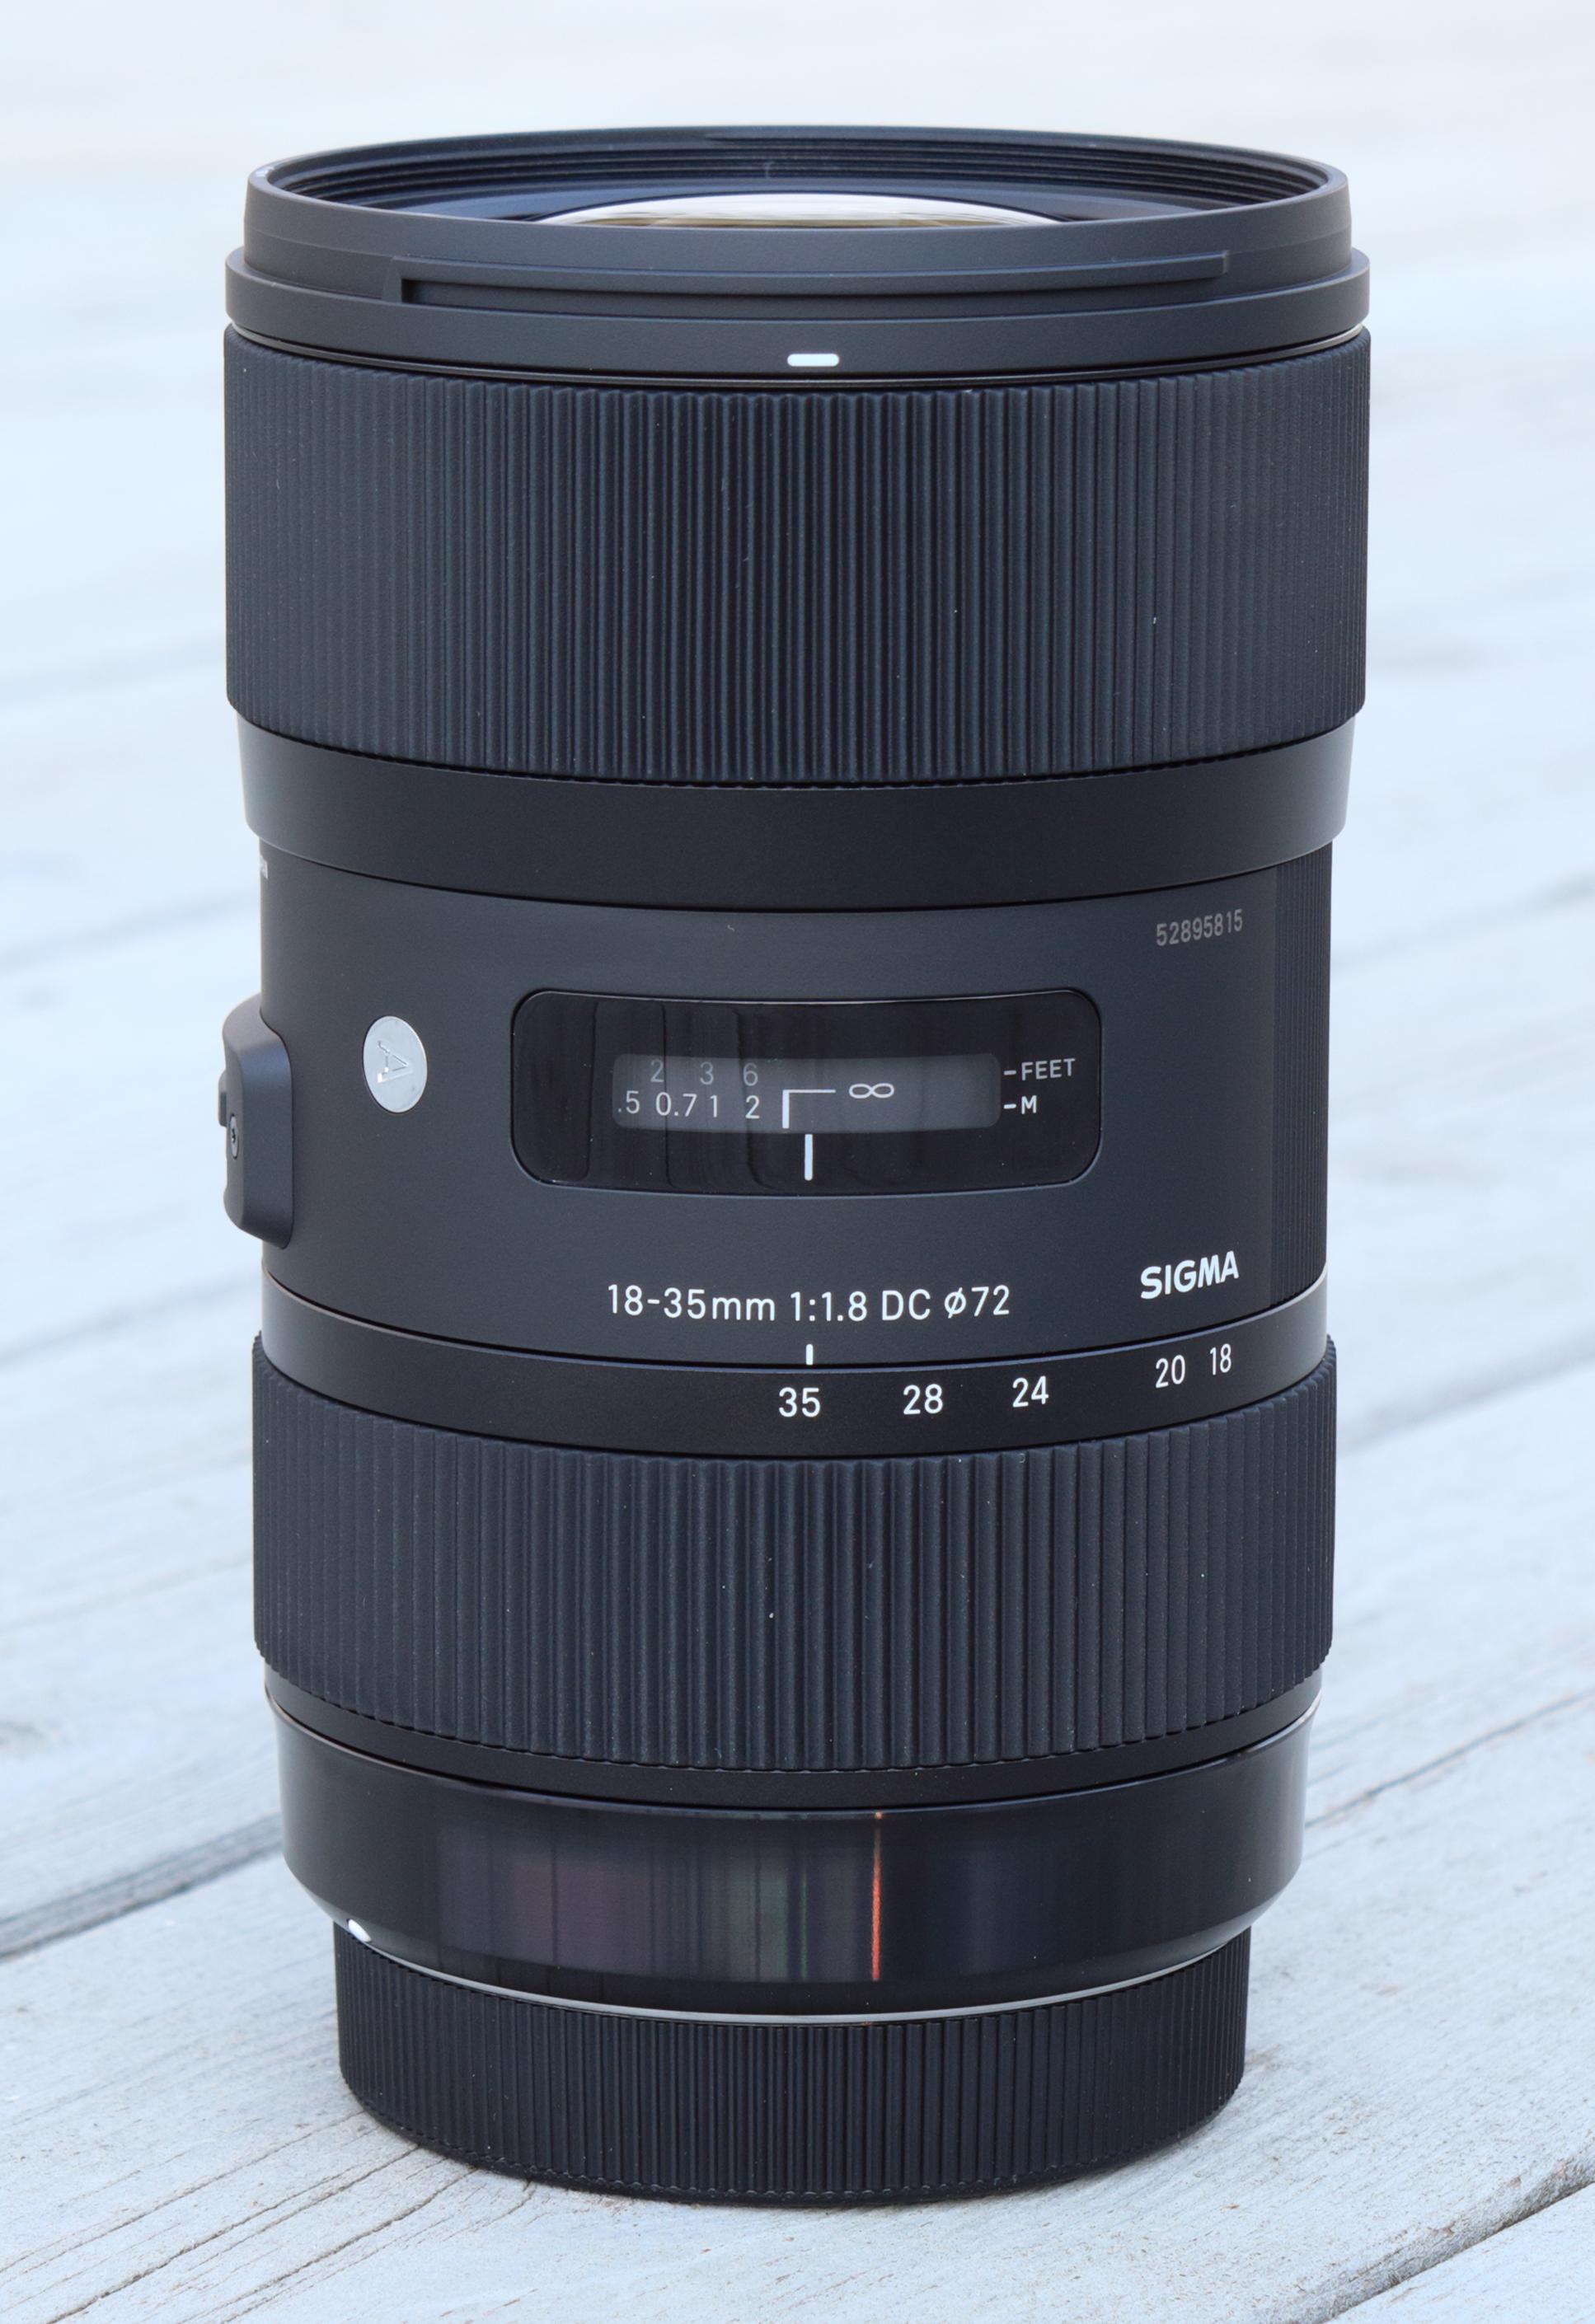 Sigma Hood for 18-35mm f//1.8 Art DC HSM Lens